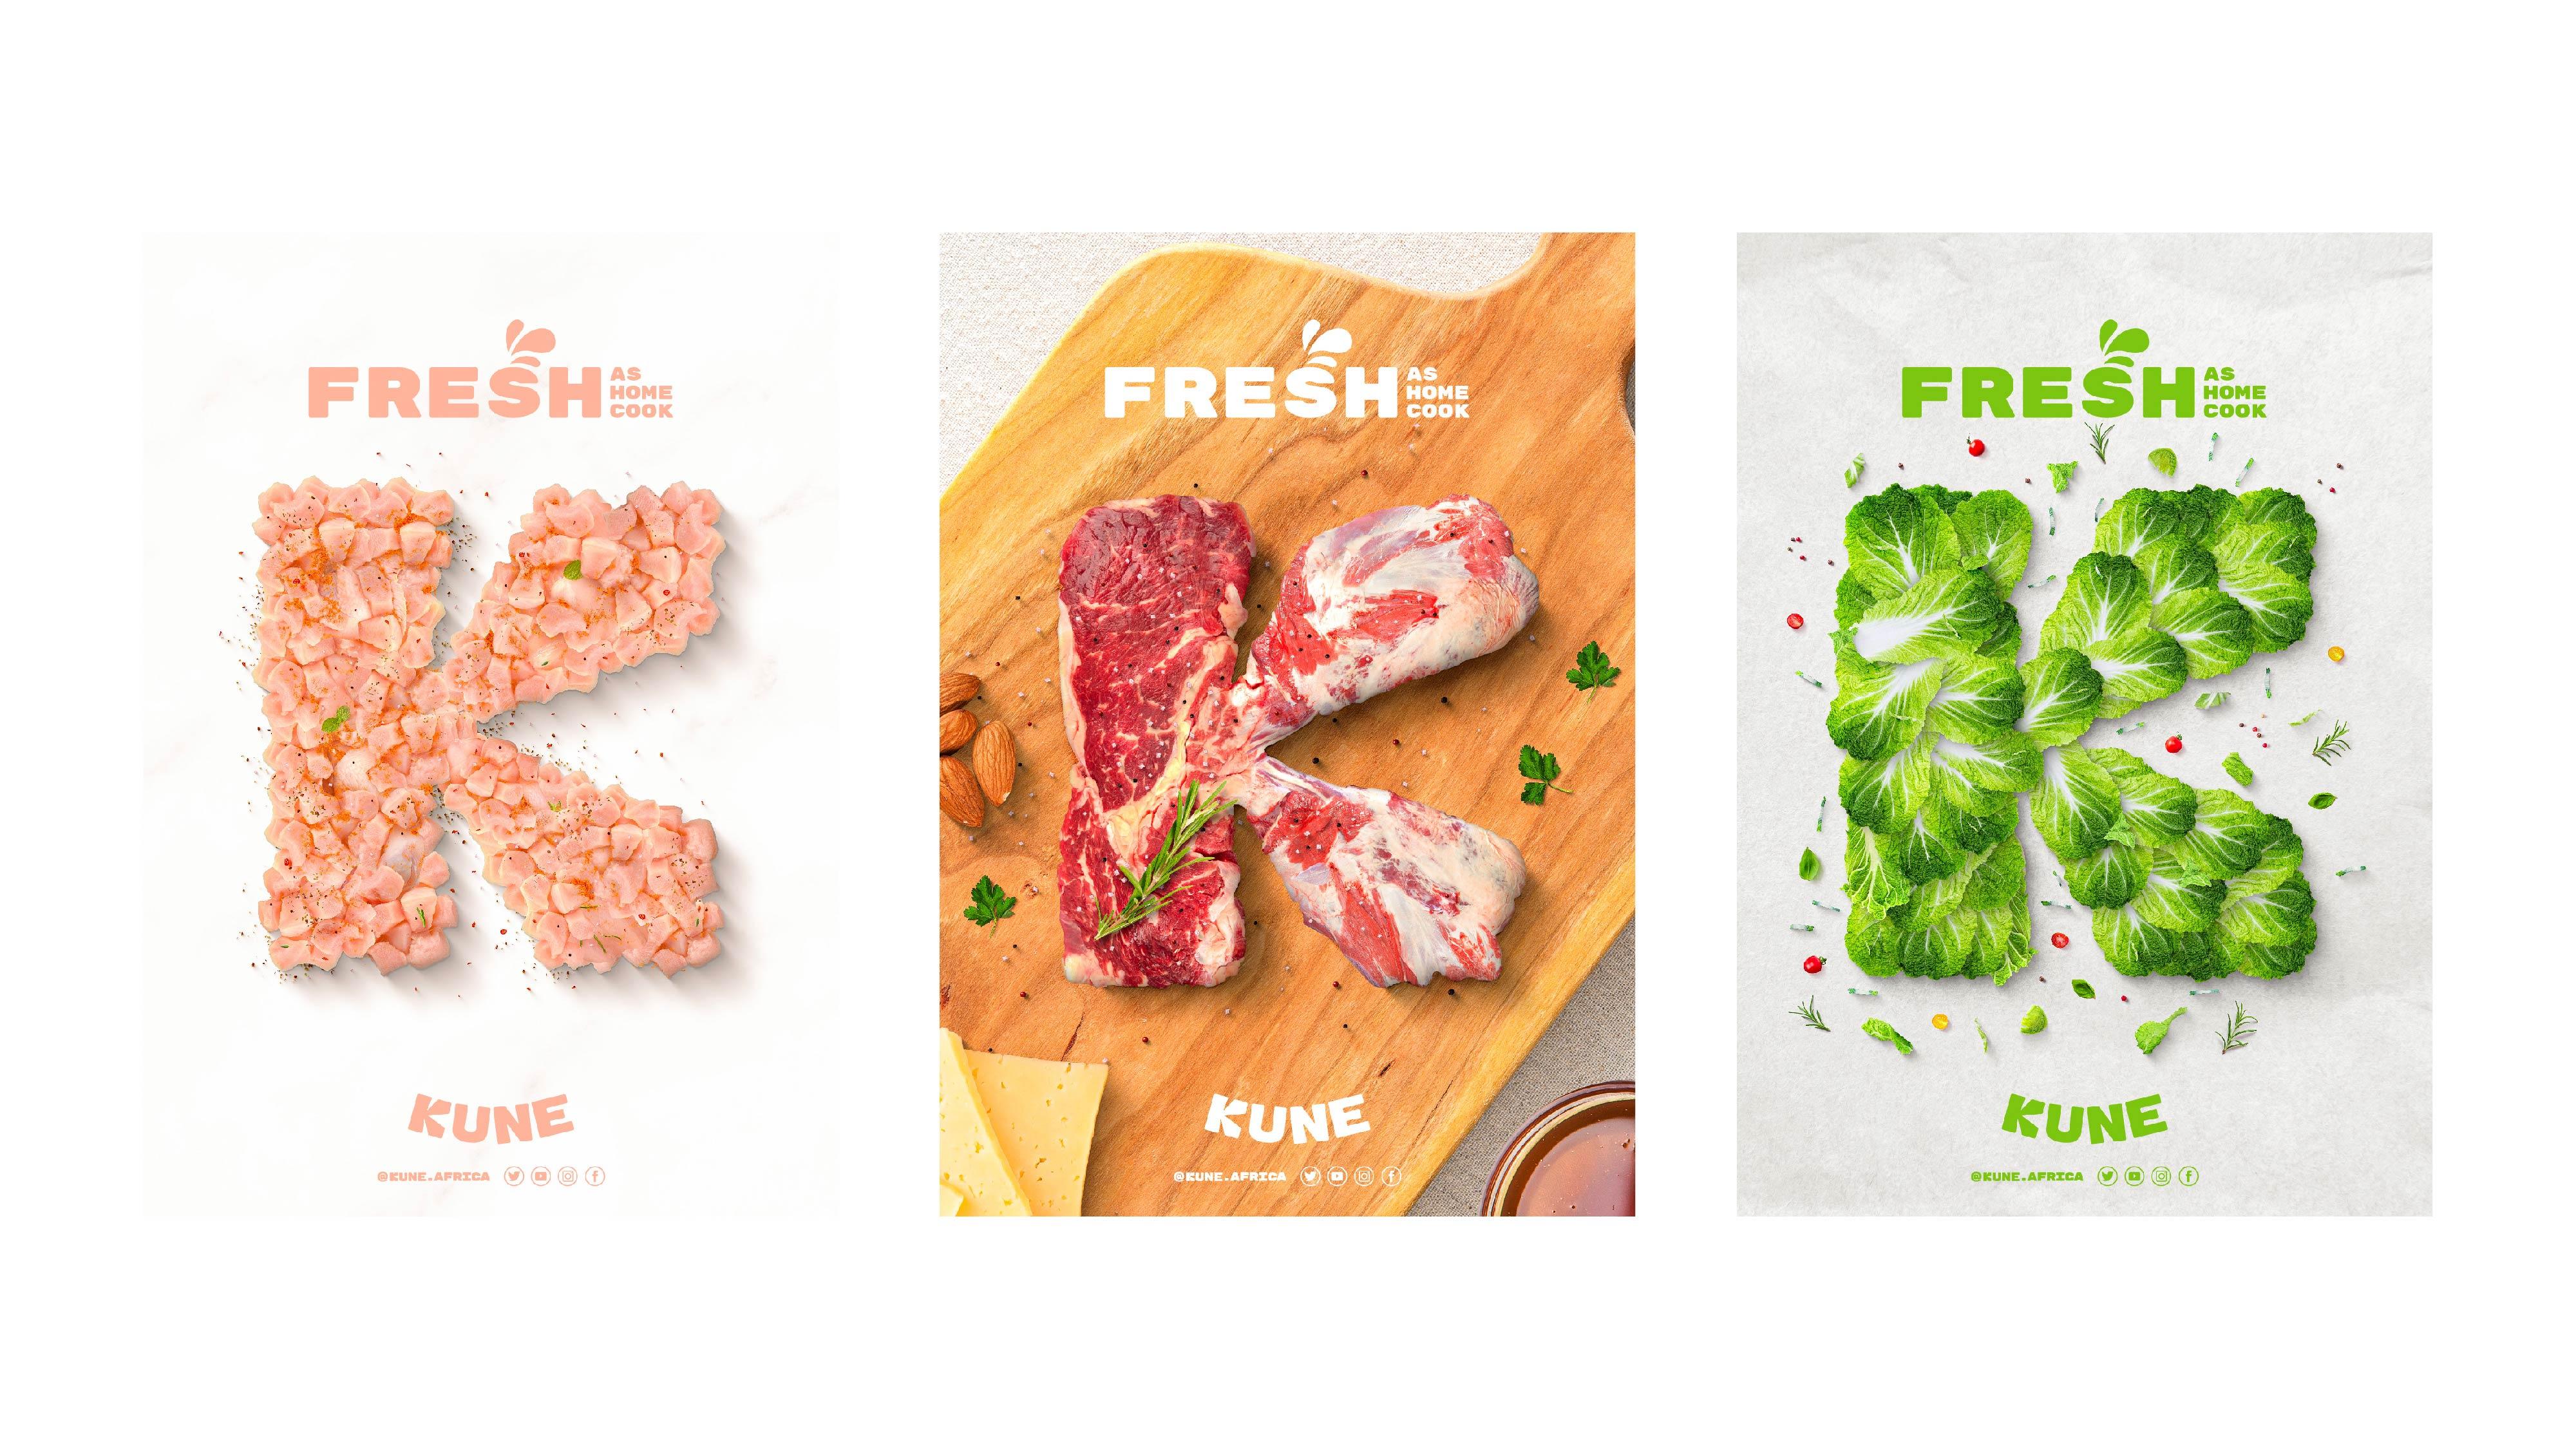 Bracom Agency Creates Brand and Packaging Design for Kune Food a Nairobi, Kenya Start-up